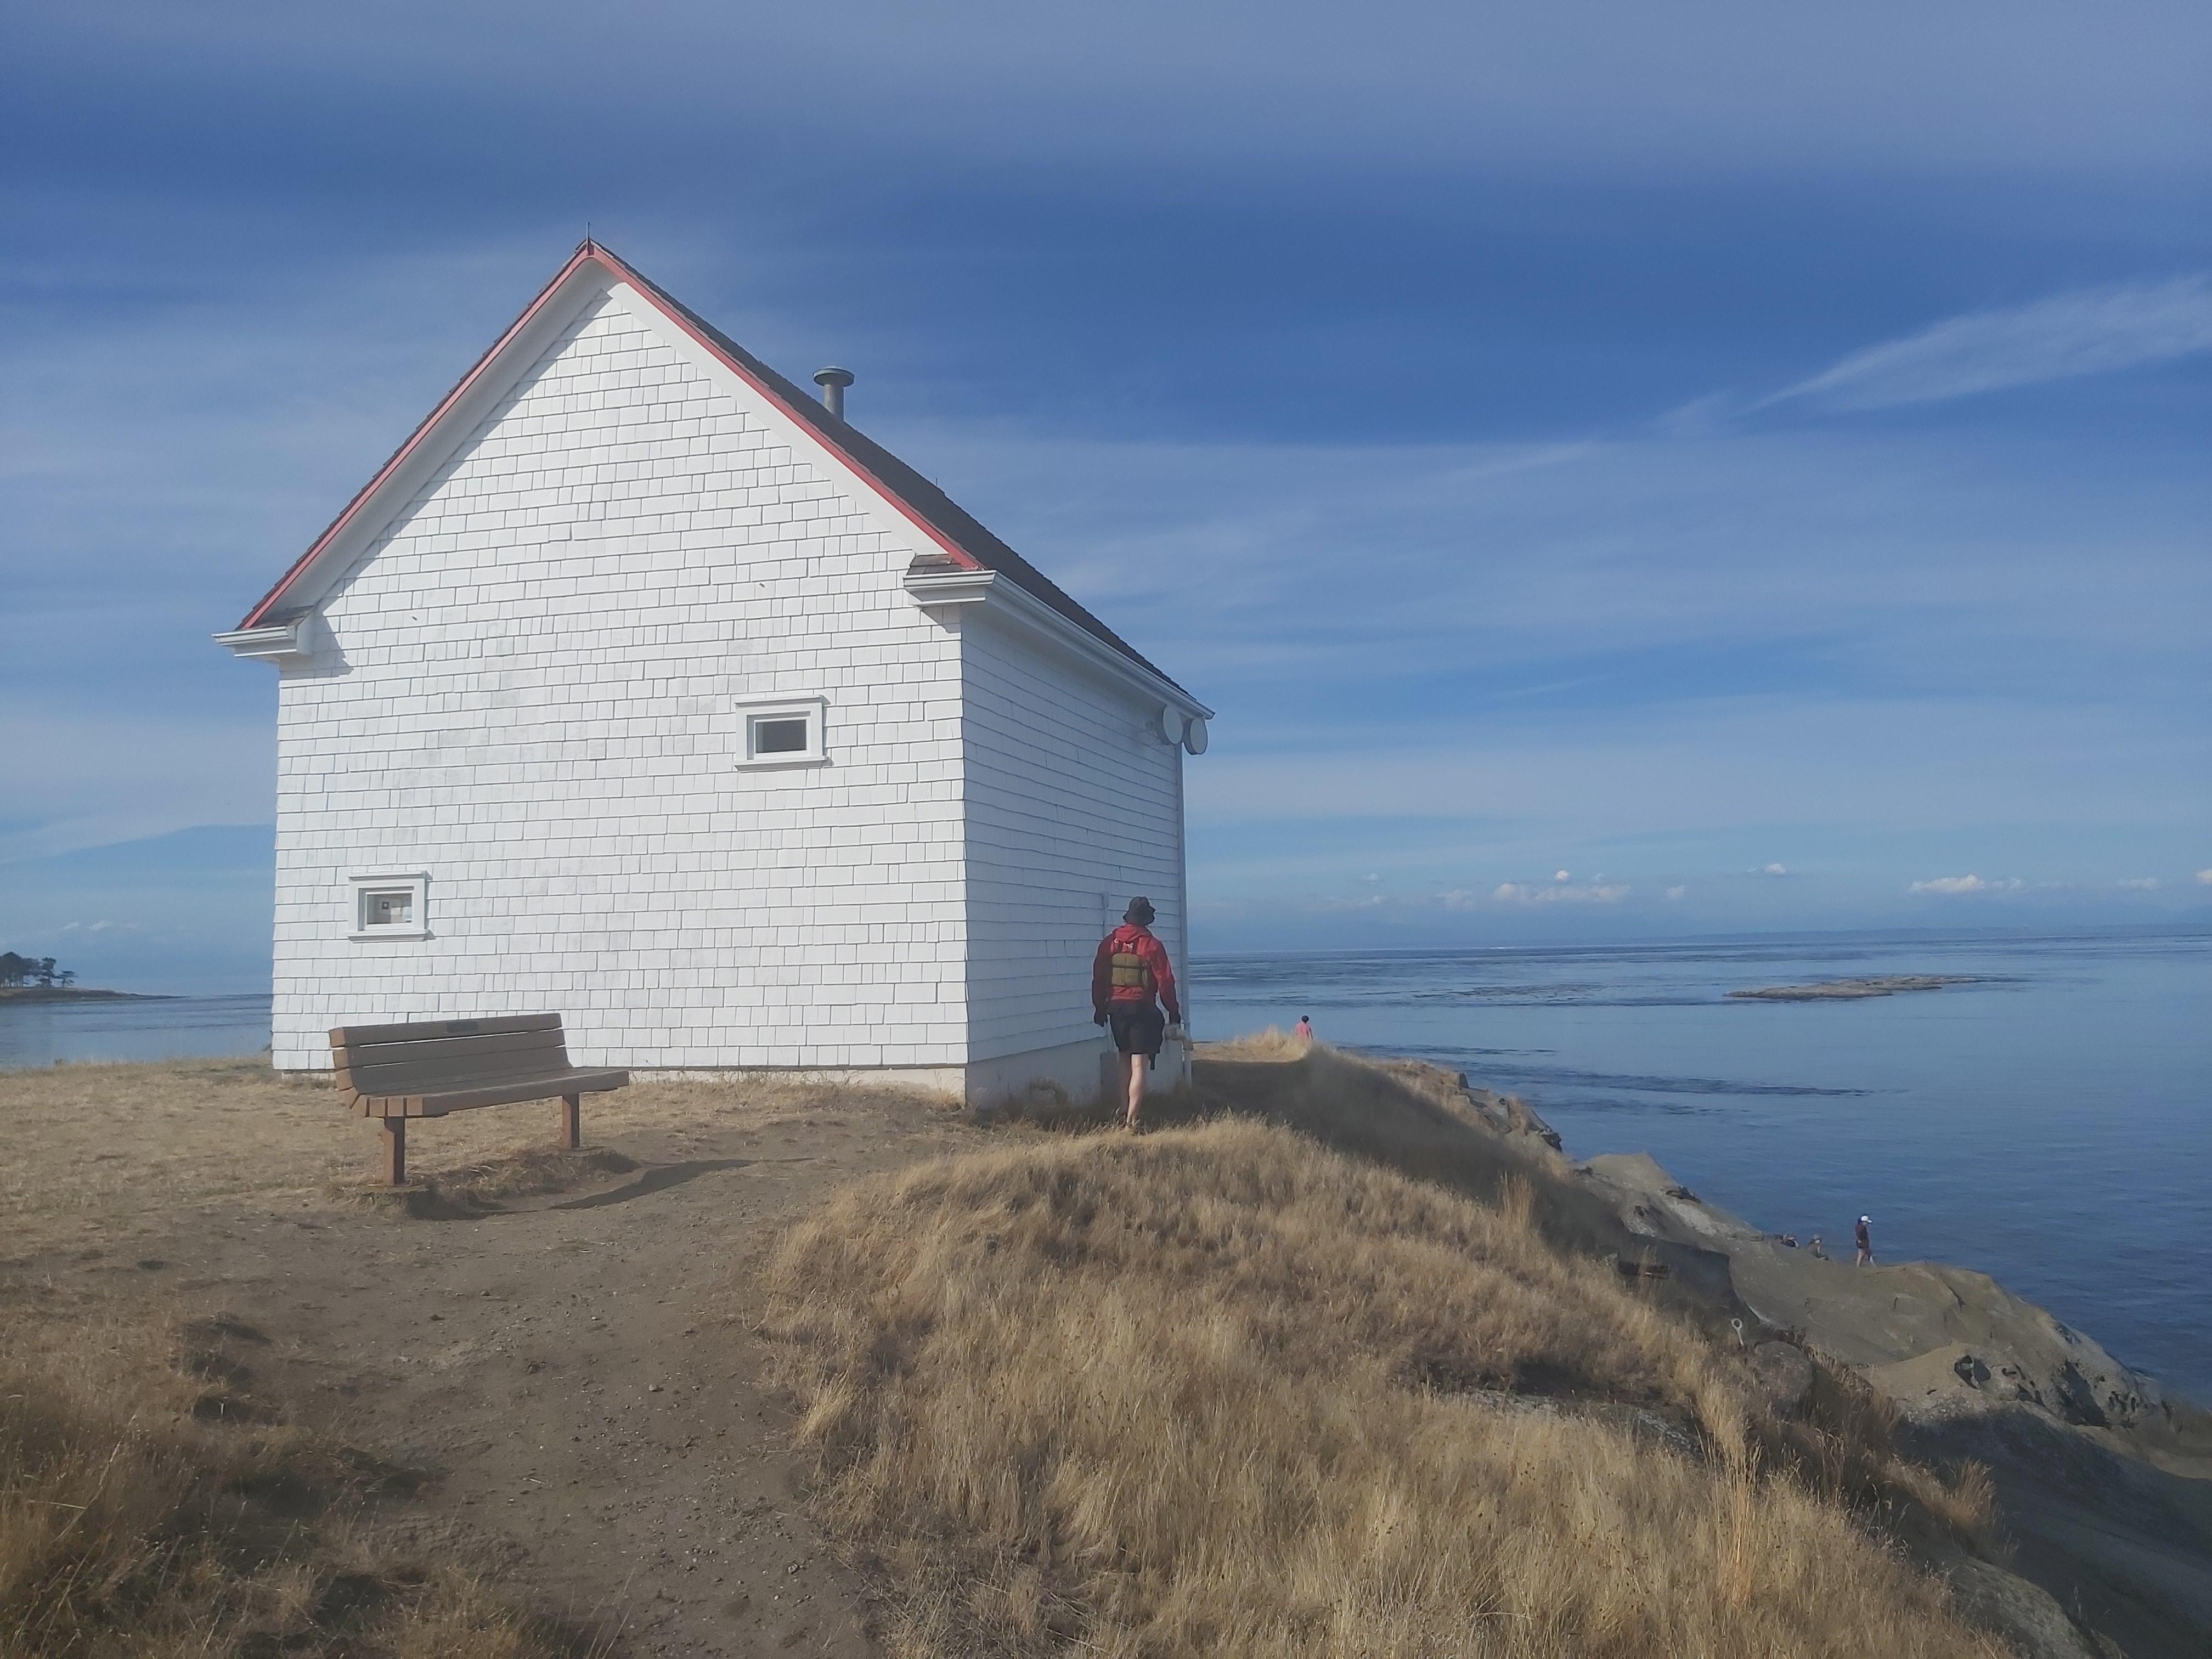 East Point, Saturna Island - Quinn Ramsay